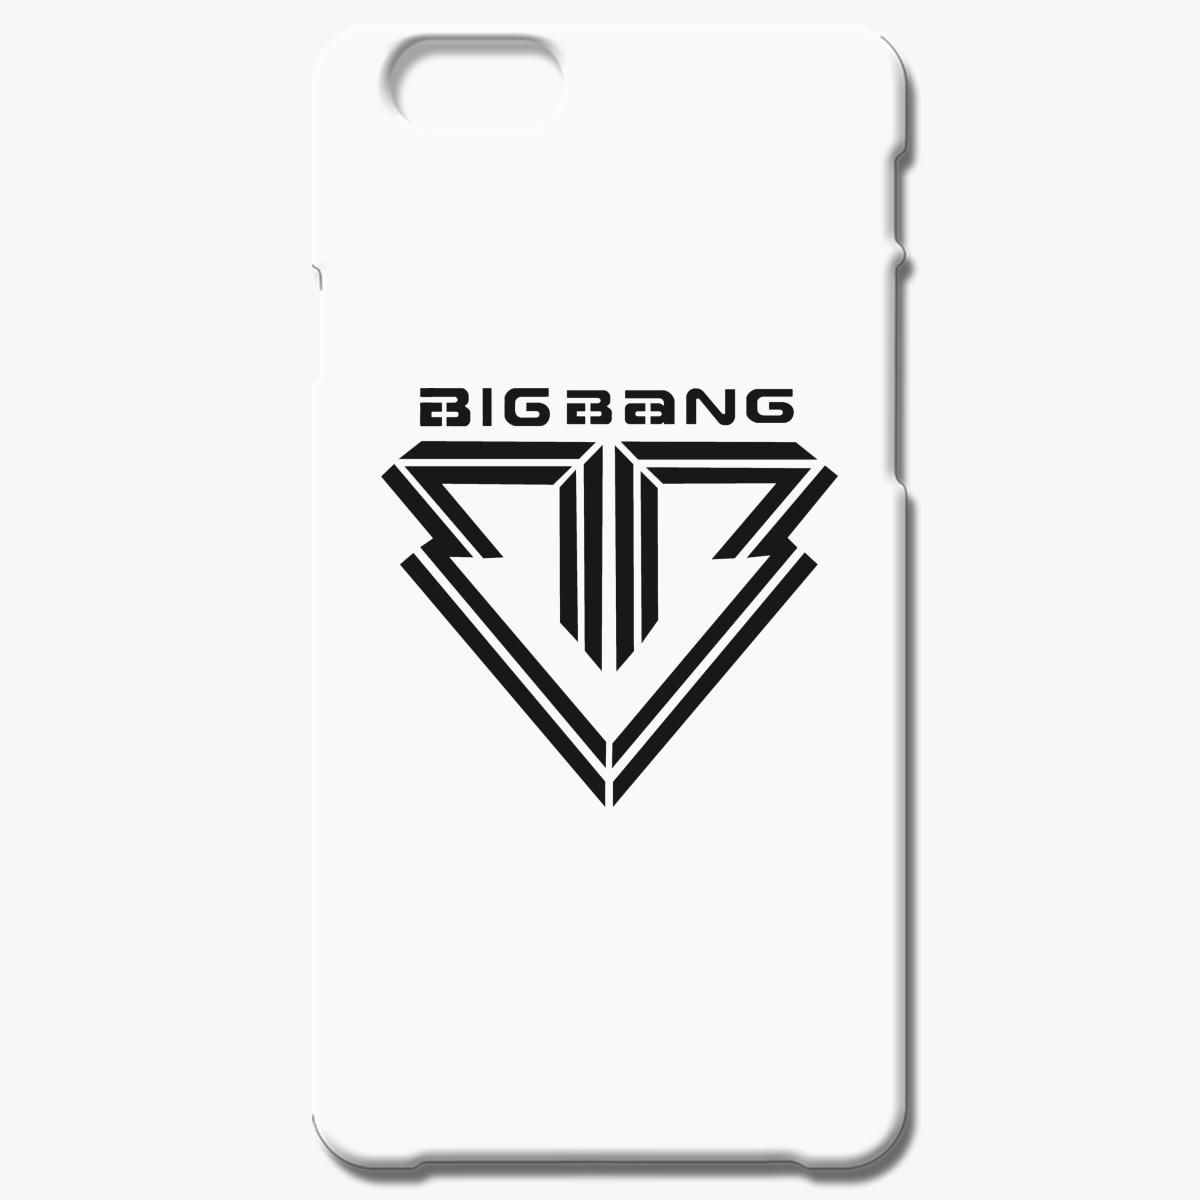 Seventeen Big Bang Bigbang Iphone 6 6s Plus Case